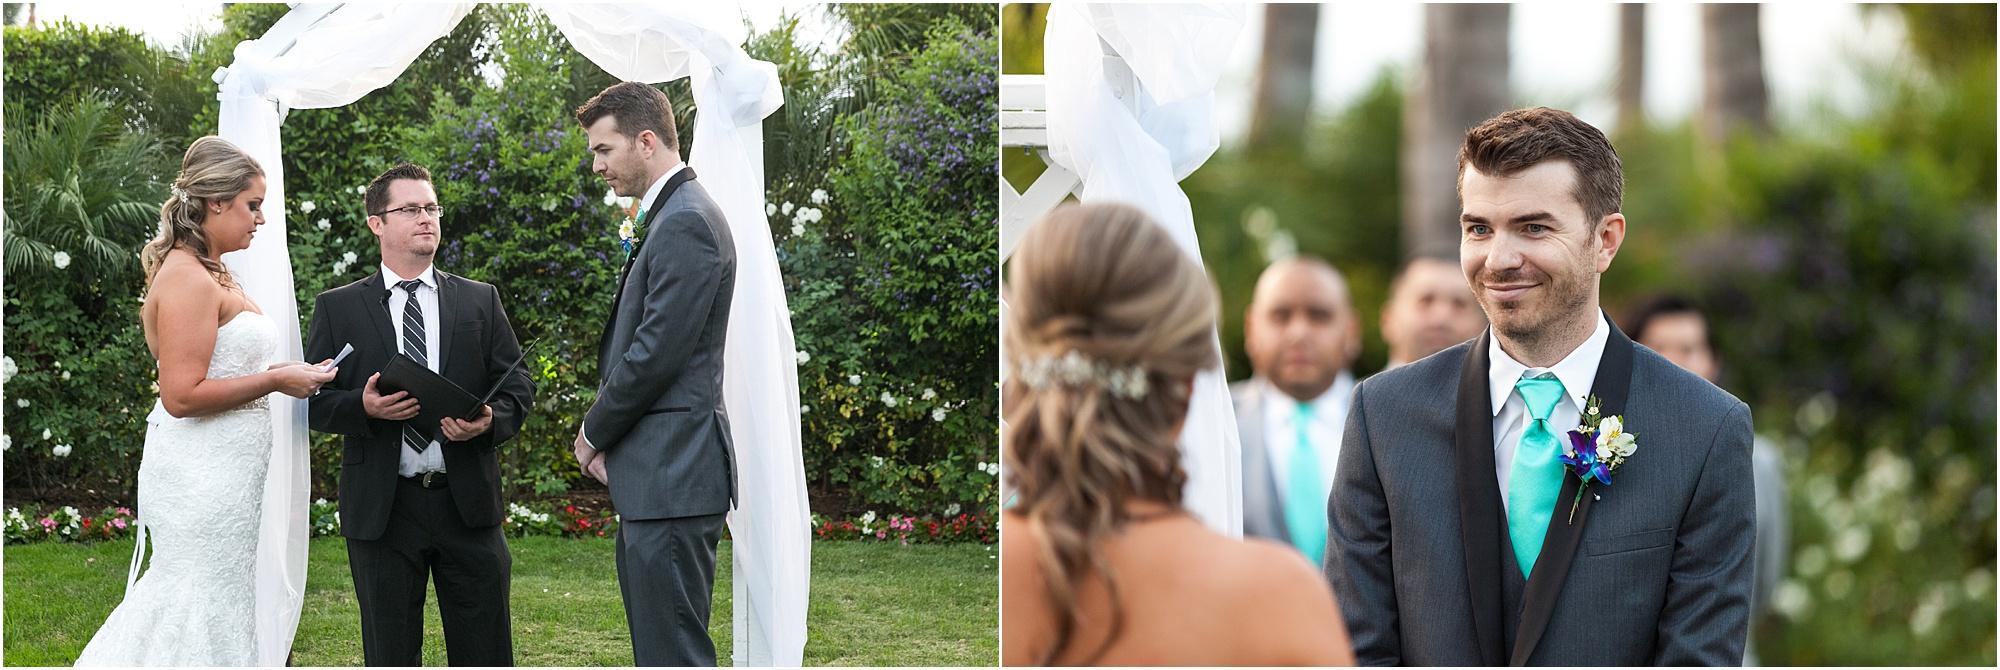 Franklin Wedding Stomps 9.jpg